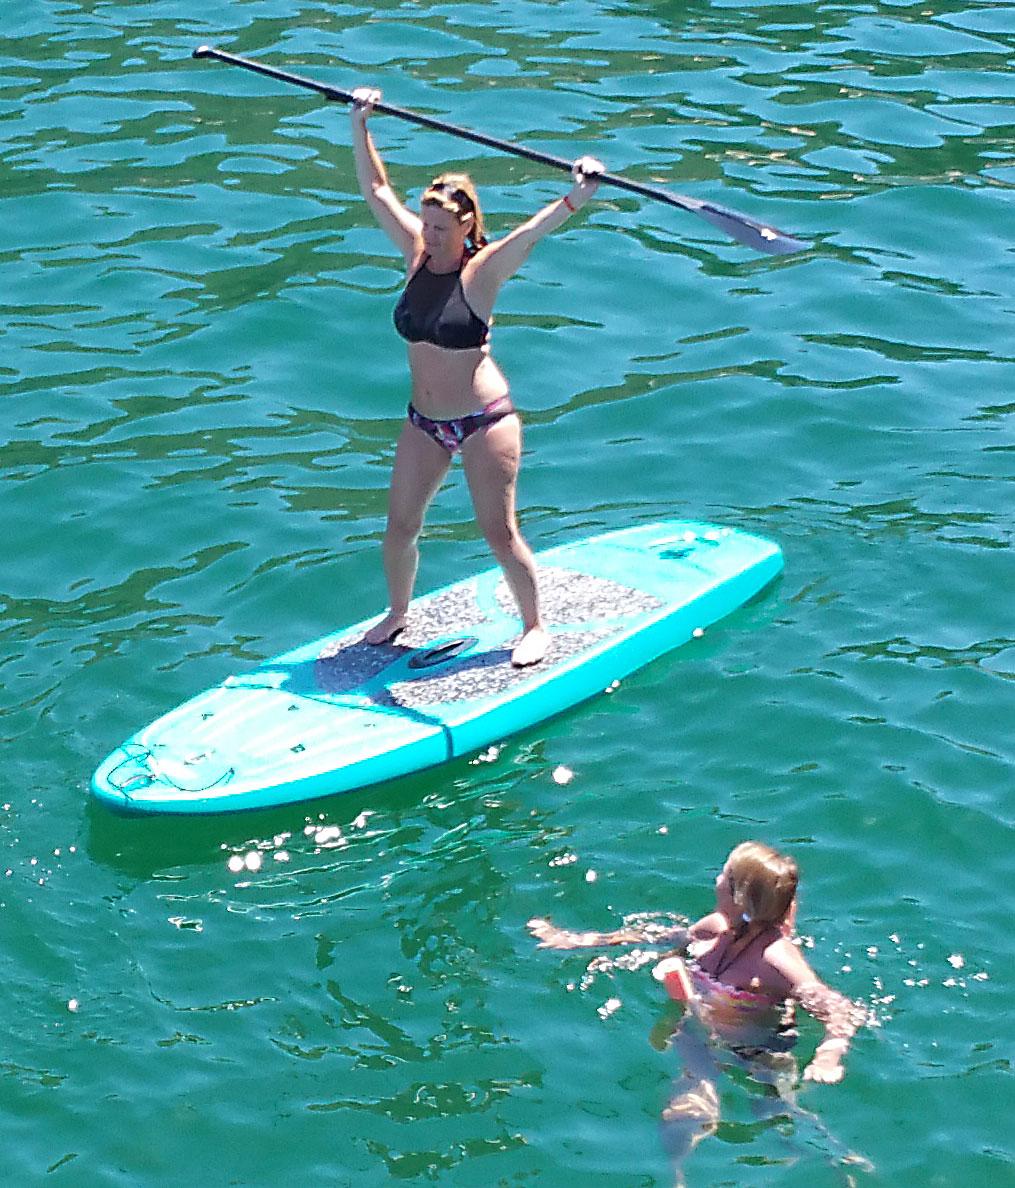 paddleboarding on the Aurora yacht